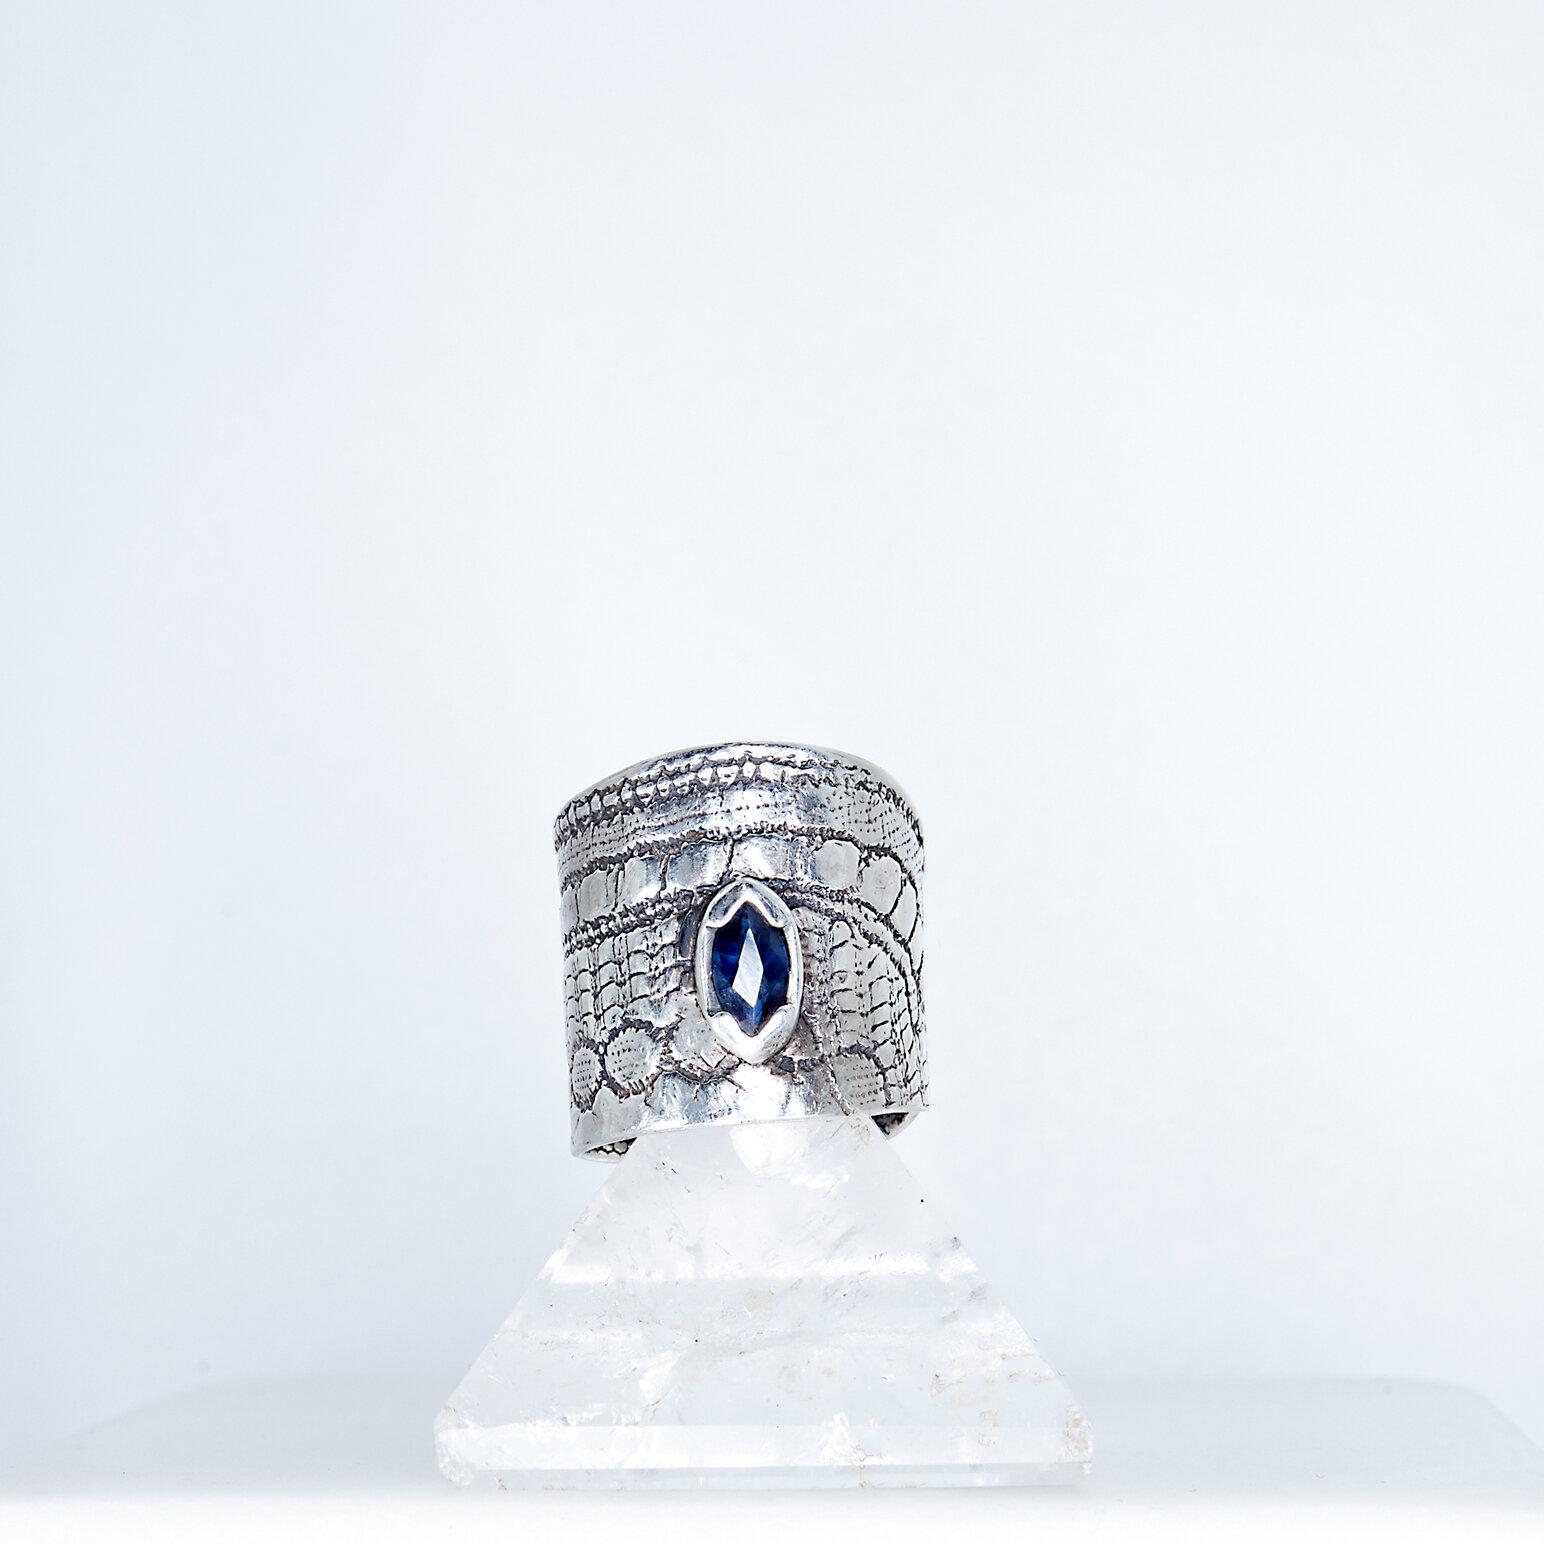 clara-jasmine-deisys-saphir-argent-bague-look-cadeau-gift.jpg